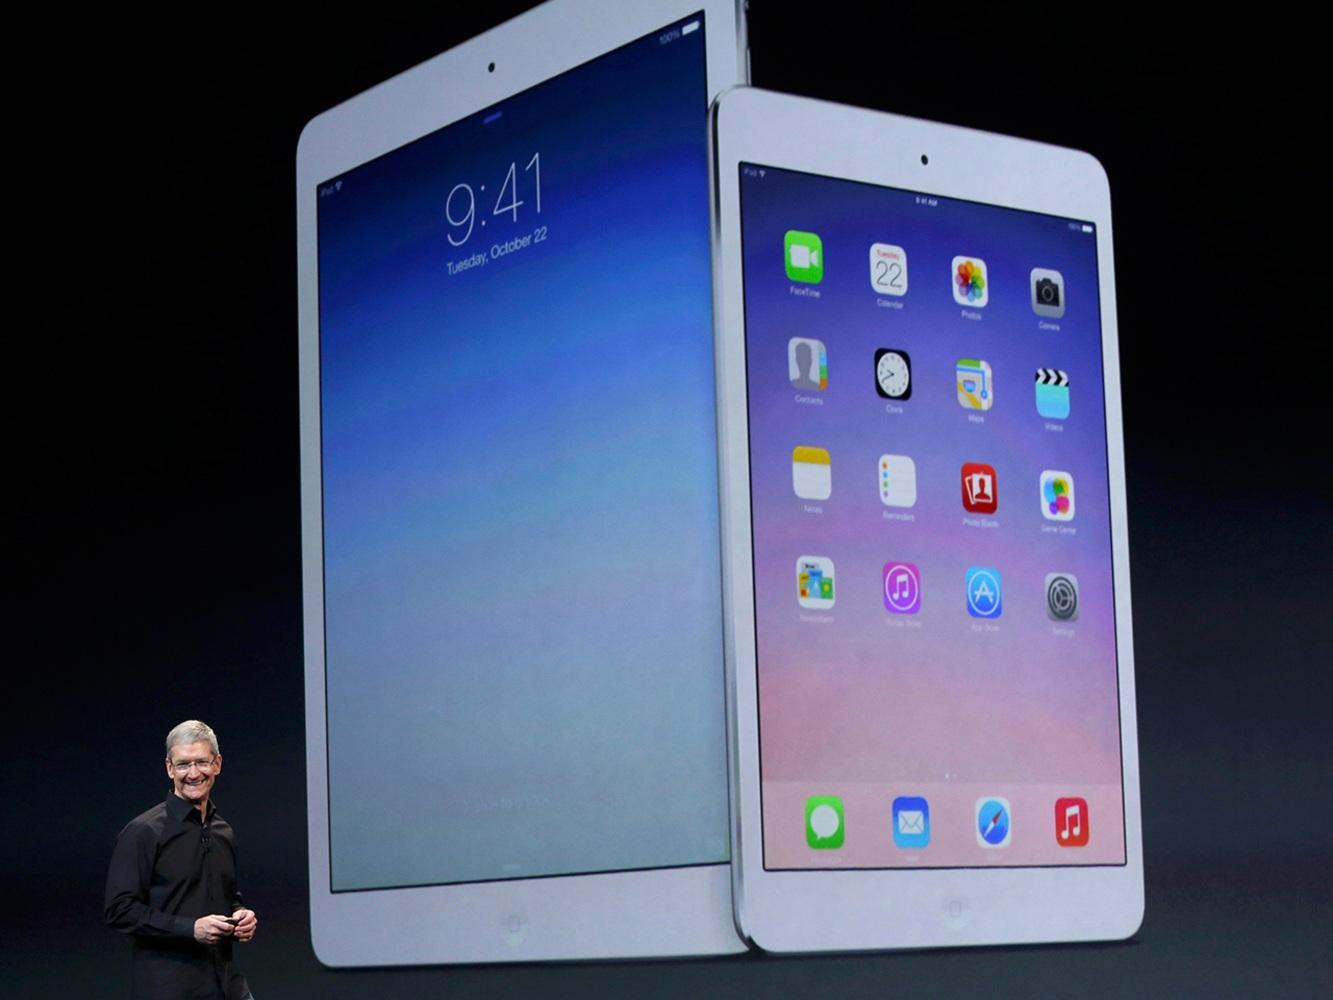 iPad becomes iPad Air, Mini gets Retina screen